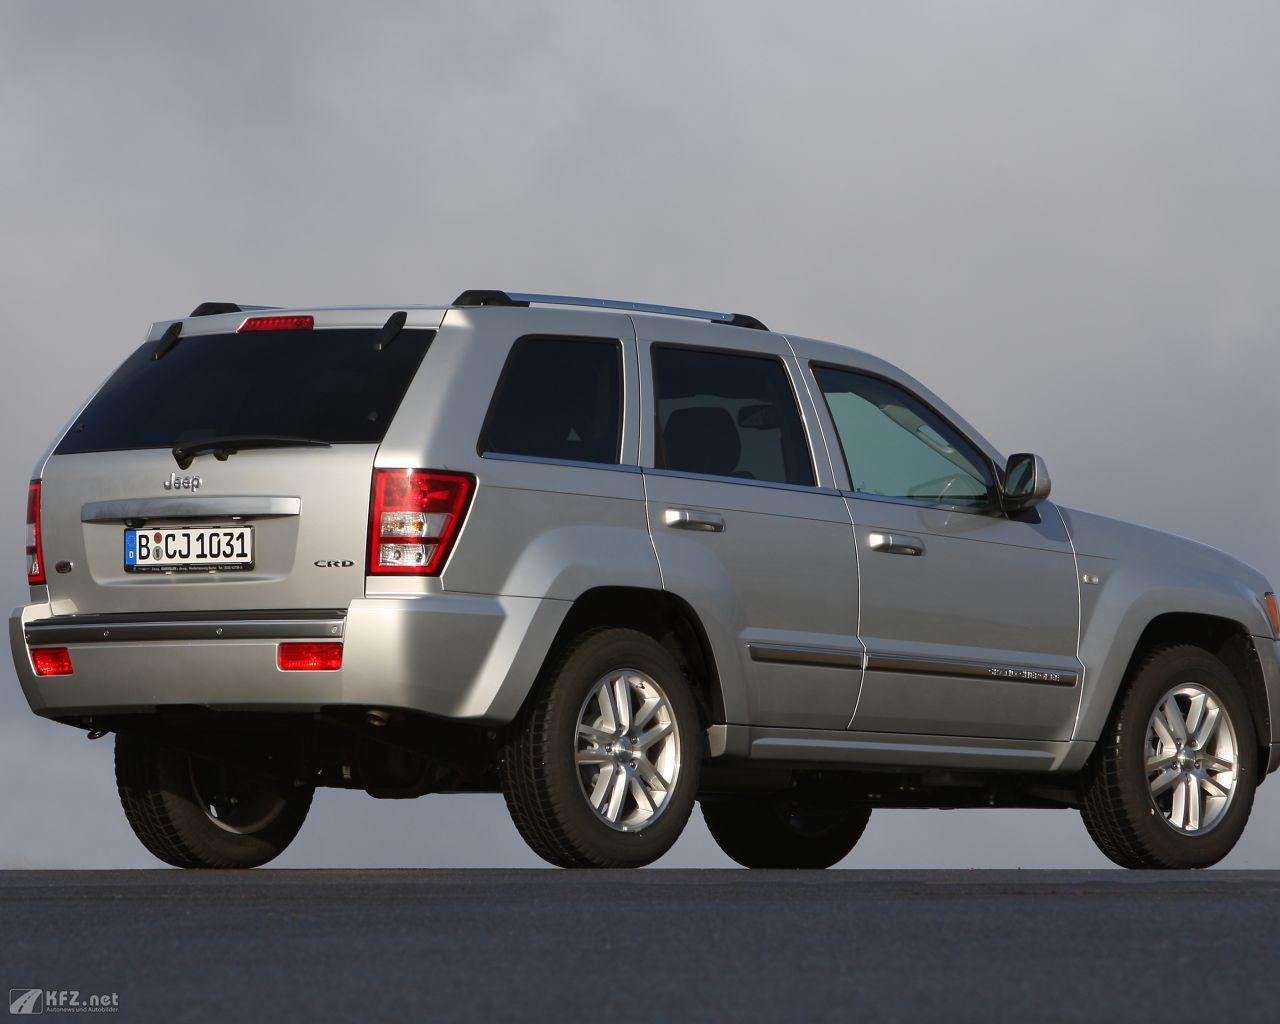 jeep-grand-cherokee-1280x1024-17